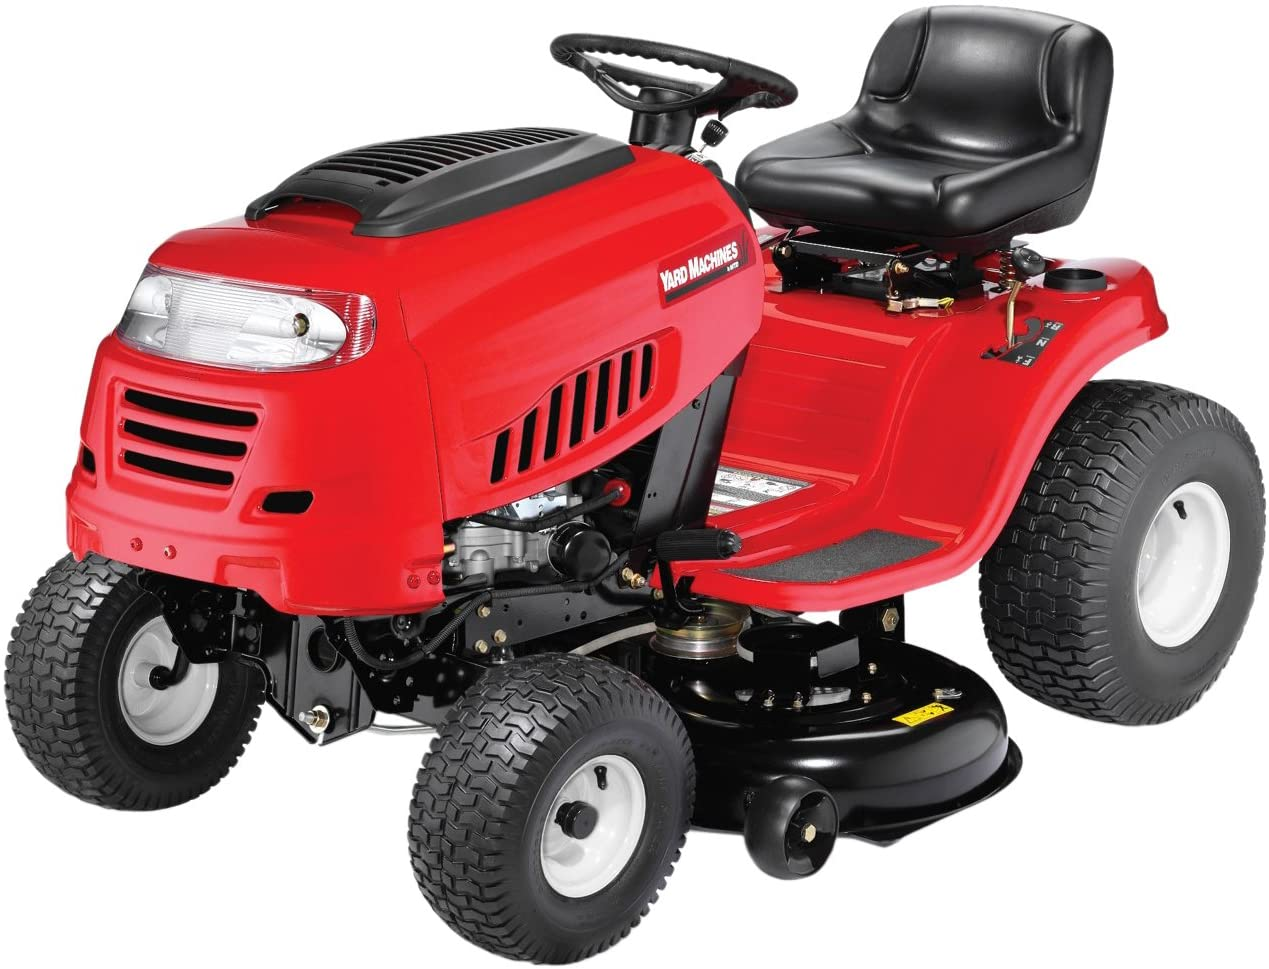 420cc 42-Inch Yard Machines Best Riding Lawn Mower